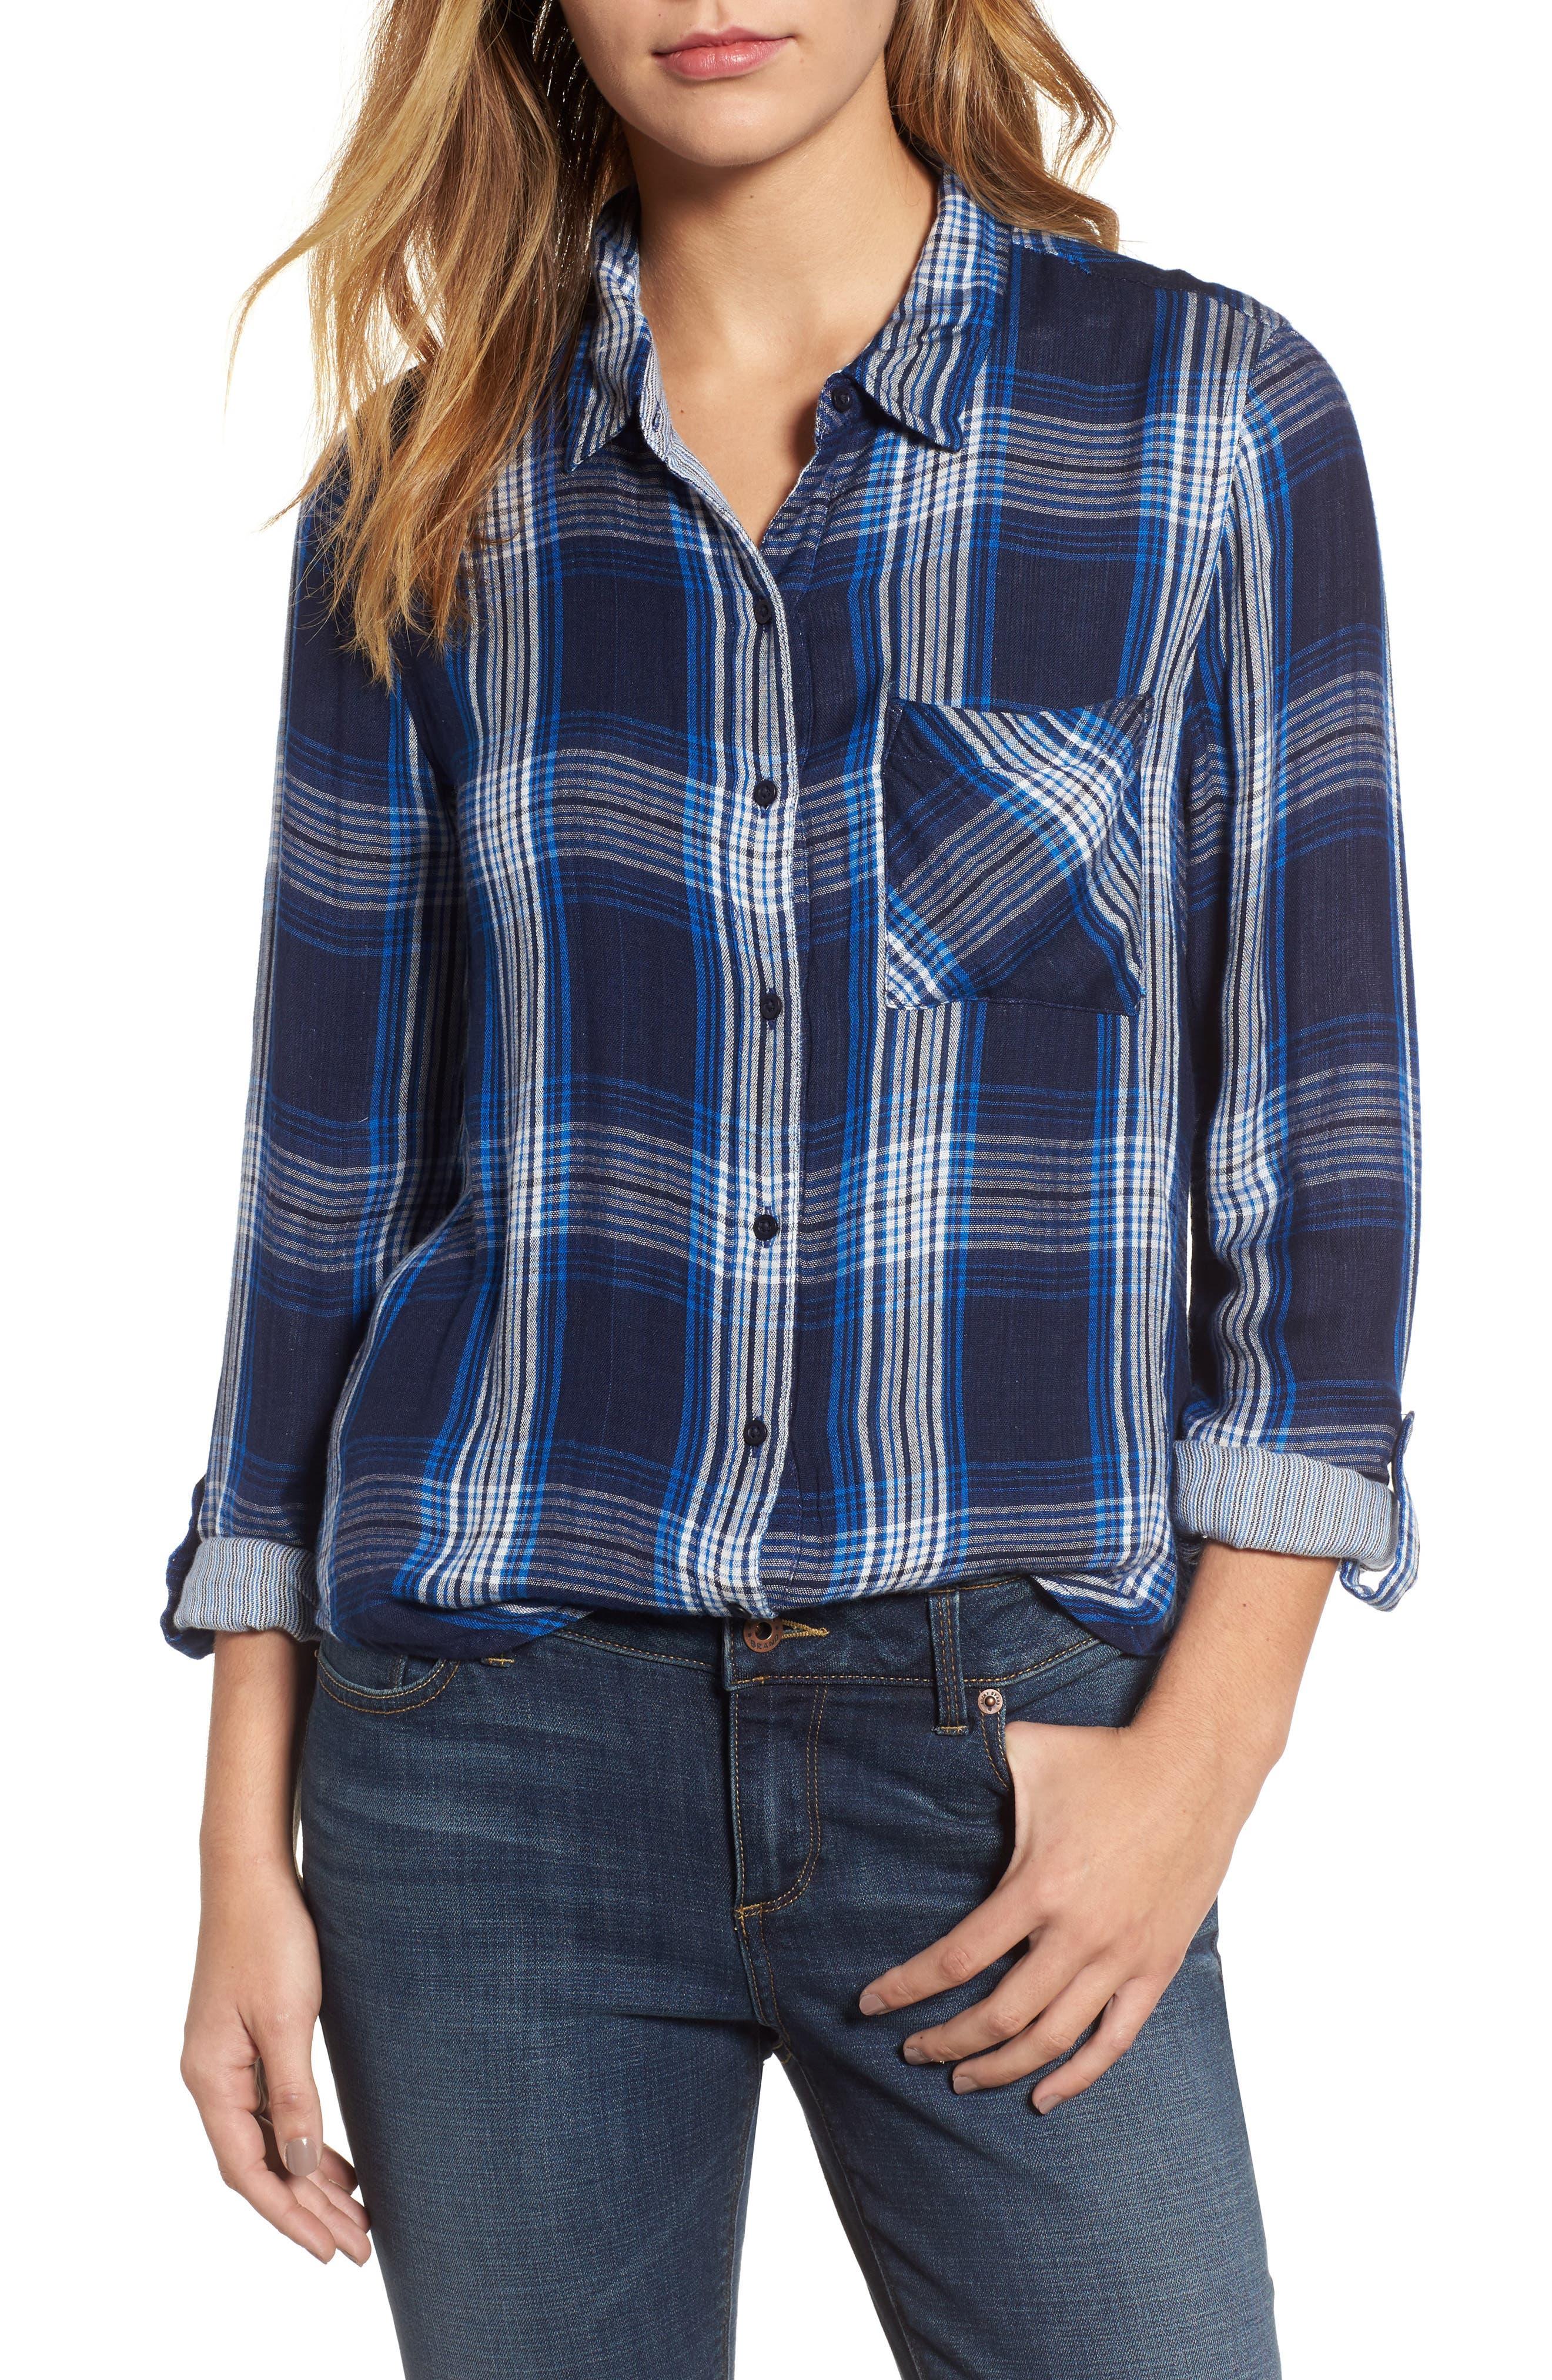 Alternate Image 1 Selected - Lucky Brand Plaid Pocket Shirt